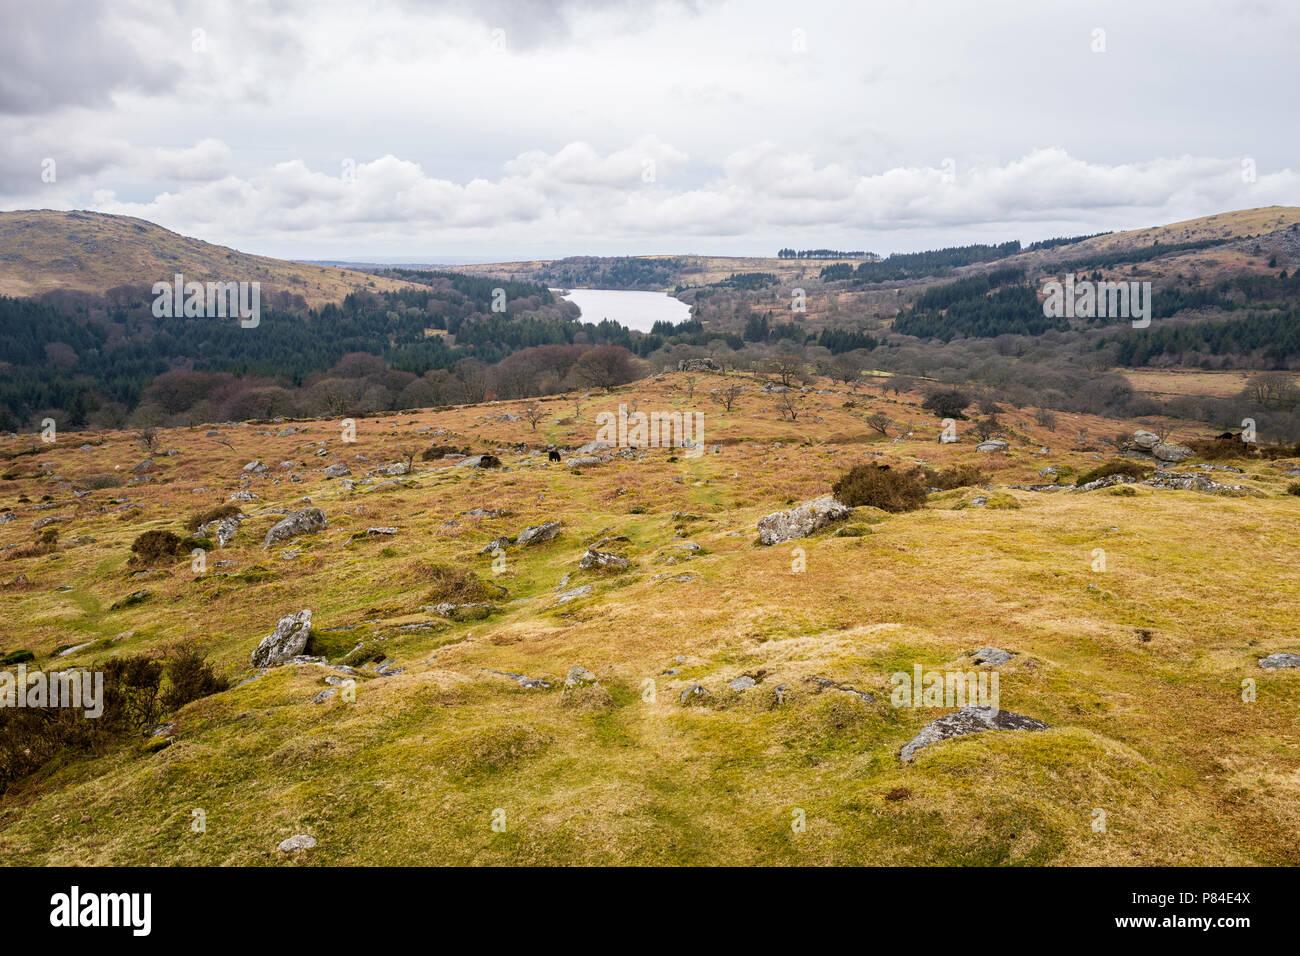 View west towards Burrator Reservoir from Middleworth Tor, Dartmoor National Park, Devon, UK.  Sheepstor, left, - Stock Image